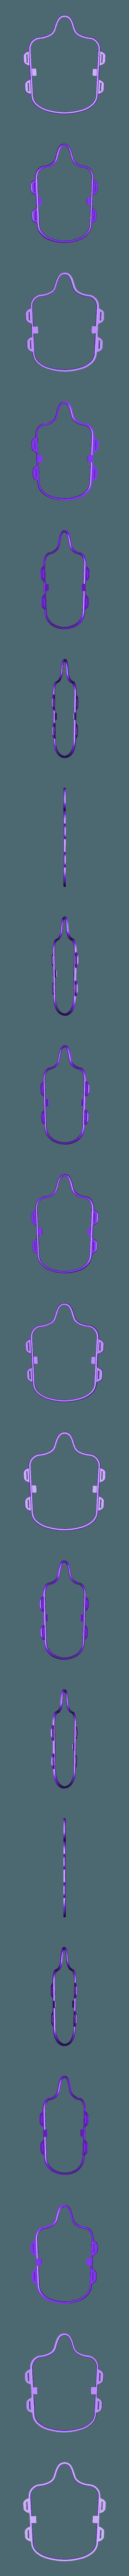 Mascarilla_Hermetica_Sin_Pines_v2.6.stl Download free STL file Hermetic Mask • 3D print design, Checho3d